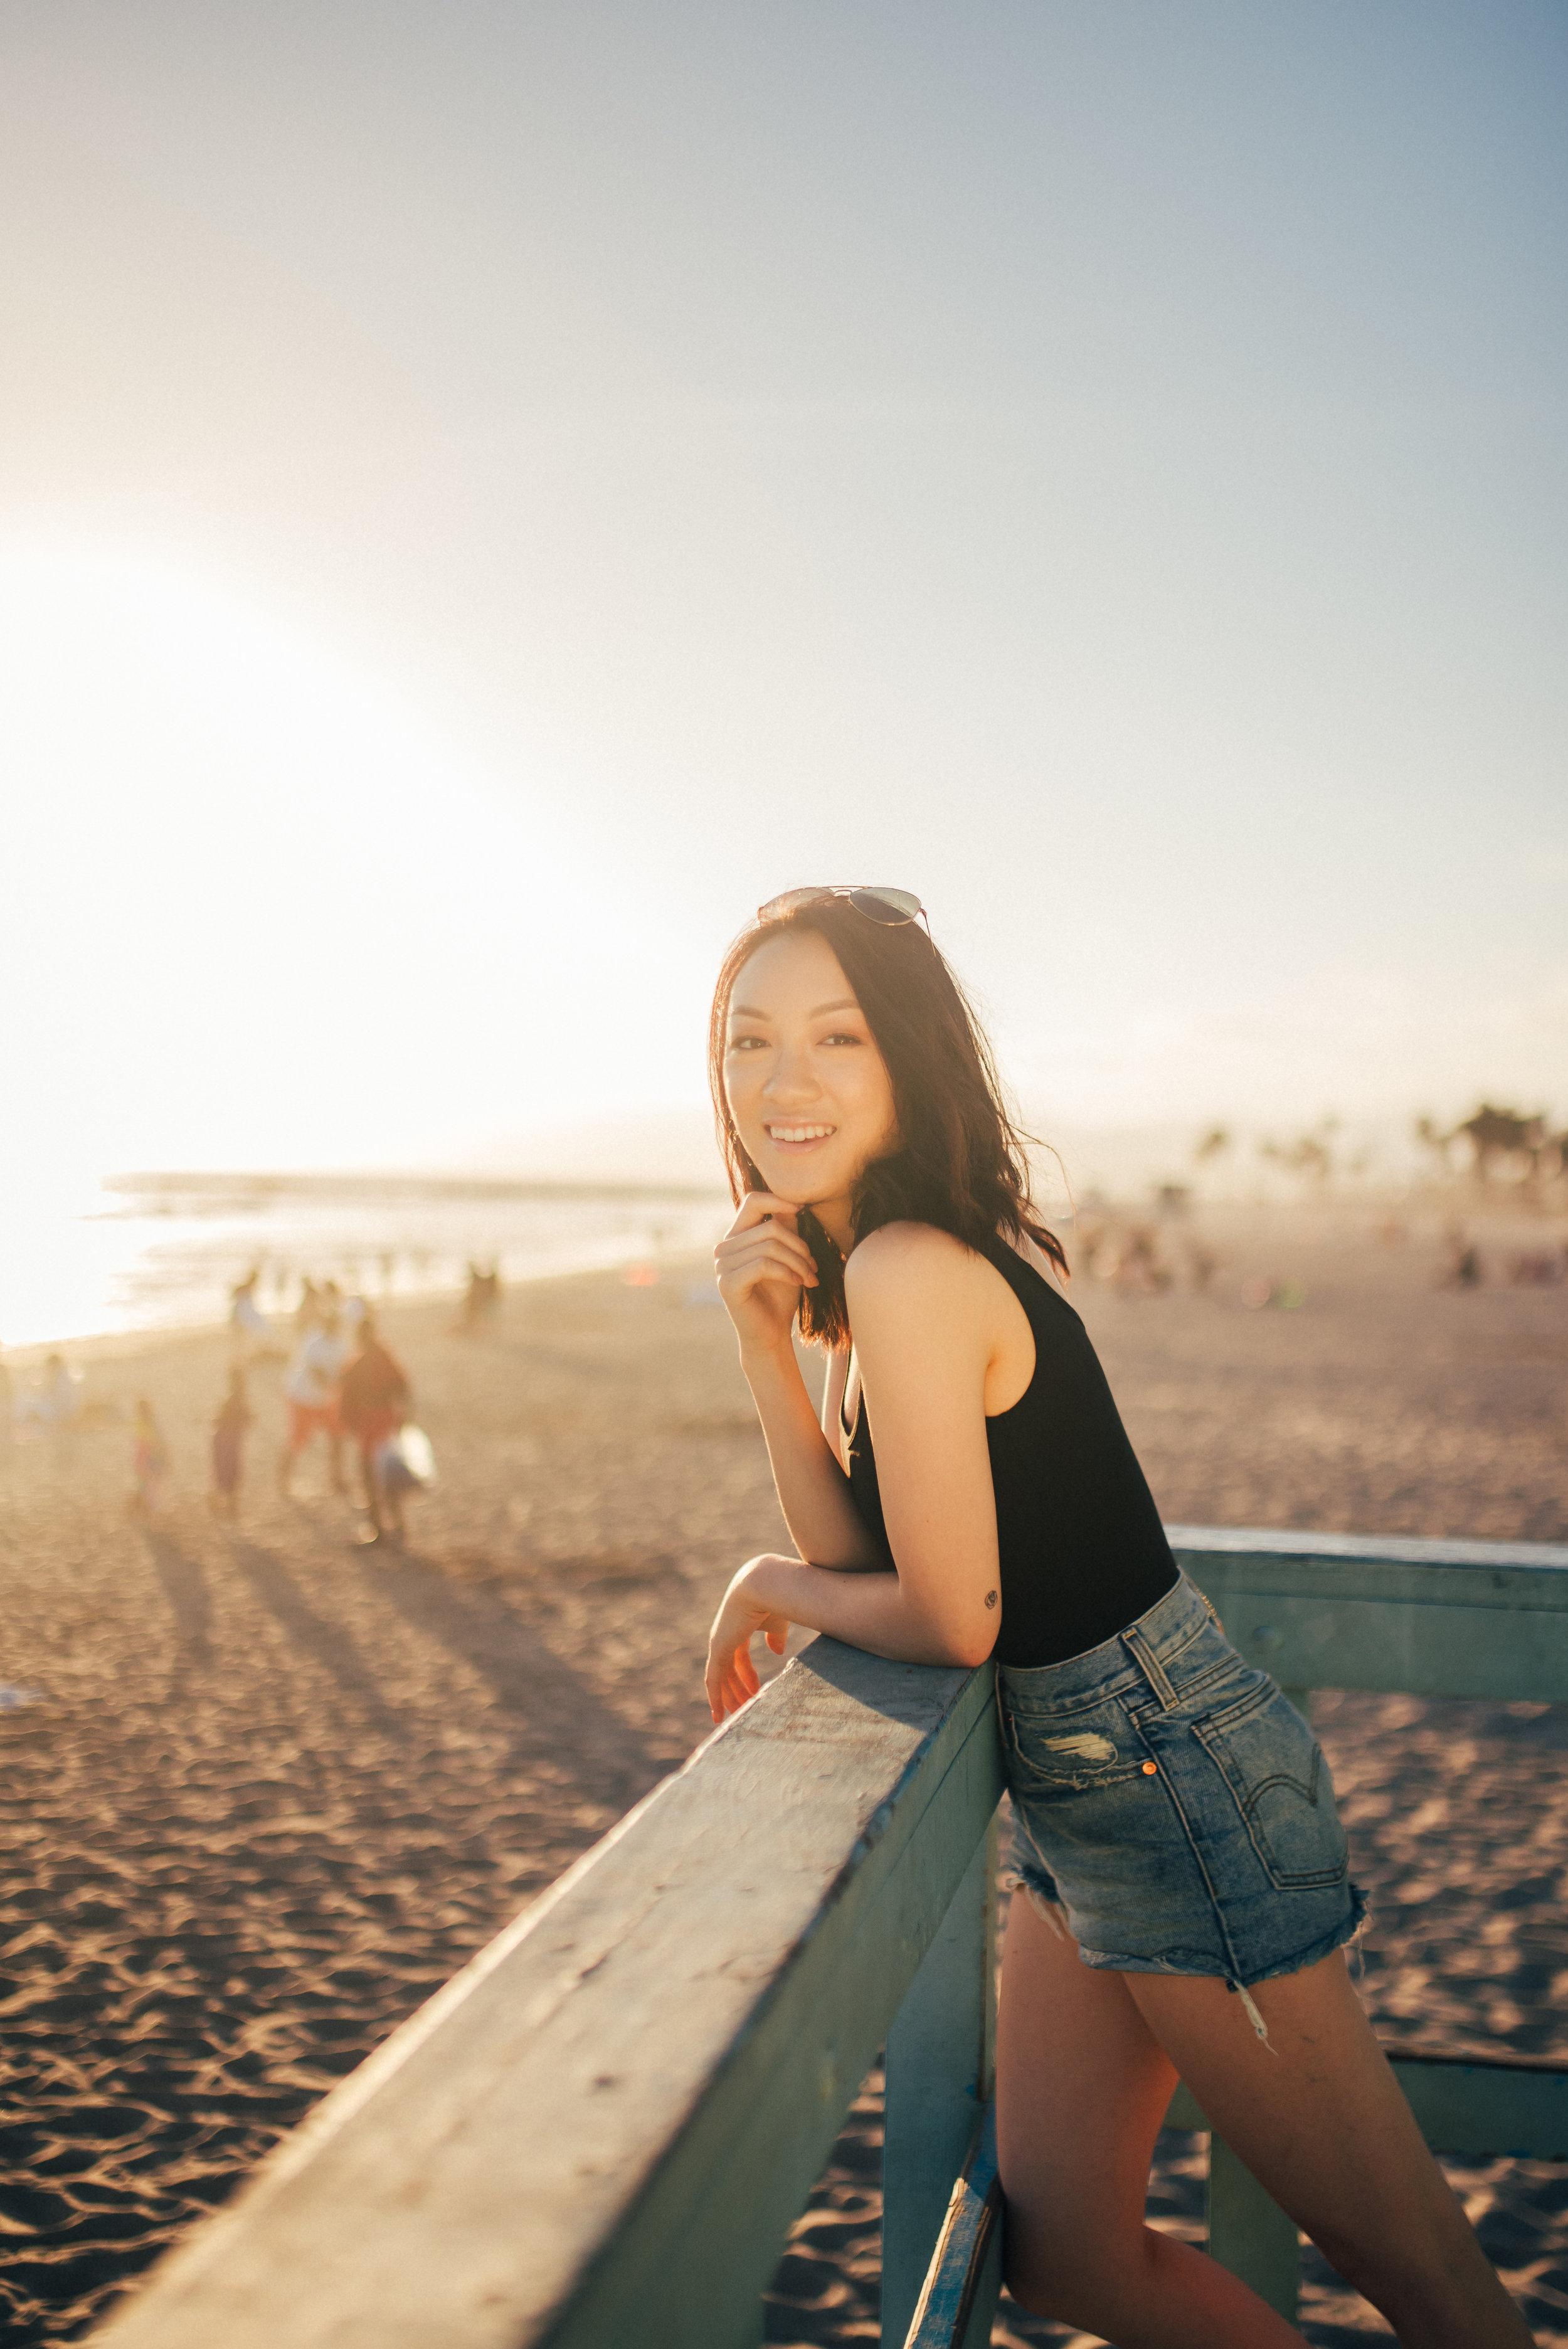 Amanda Rach Lee